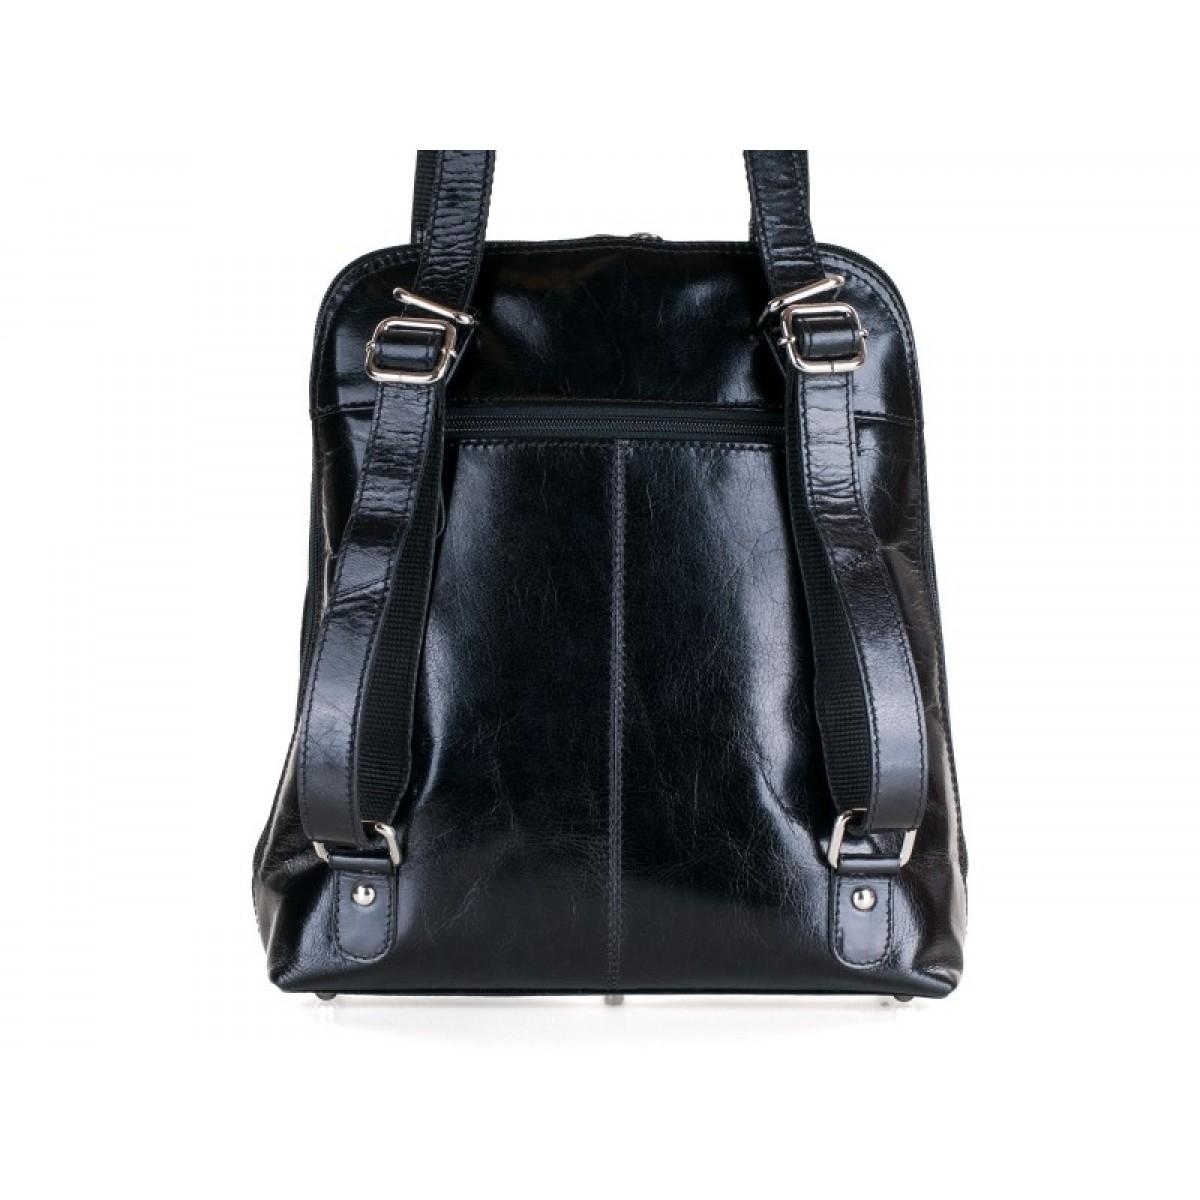 Combi rygsæk i sort-35